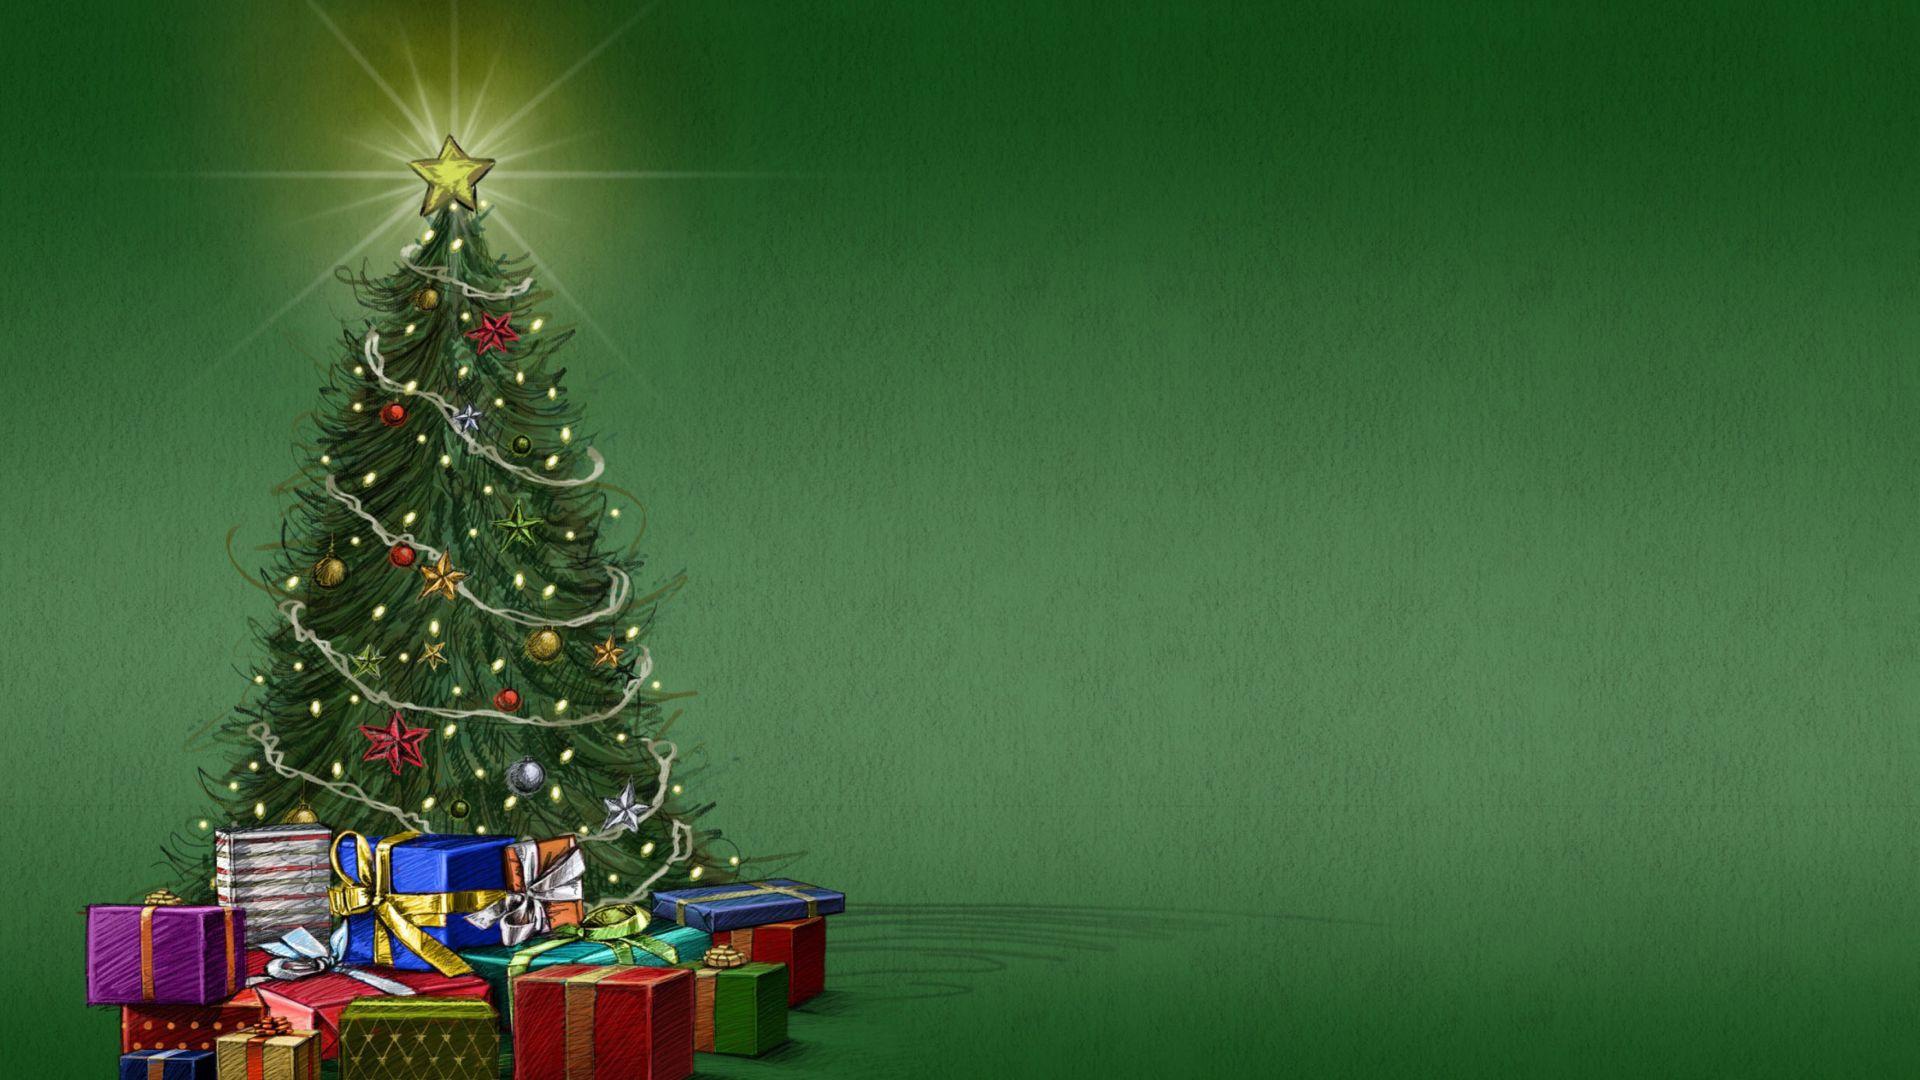 Christmas For Website hd wallpaper for laptop